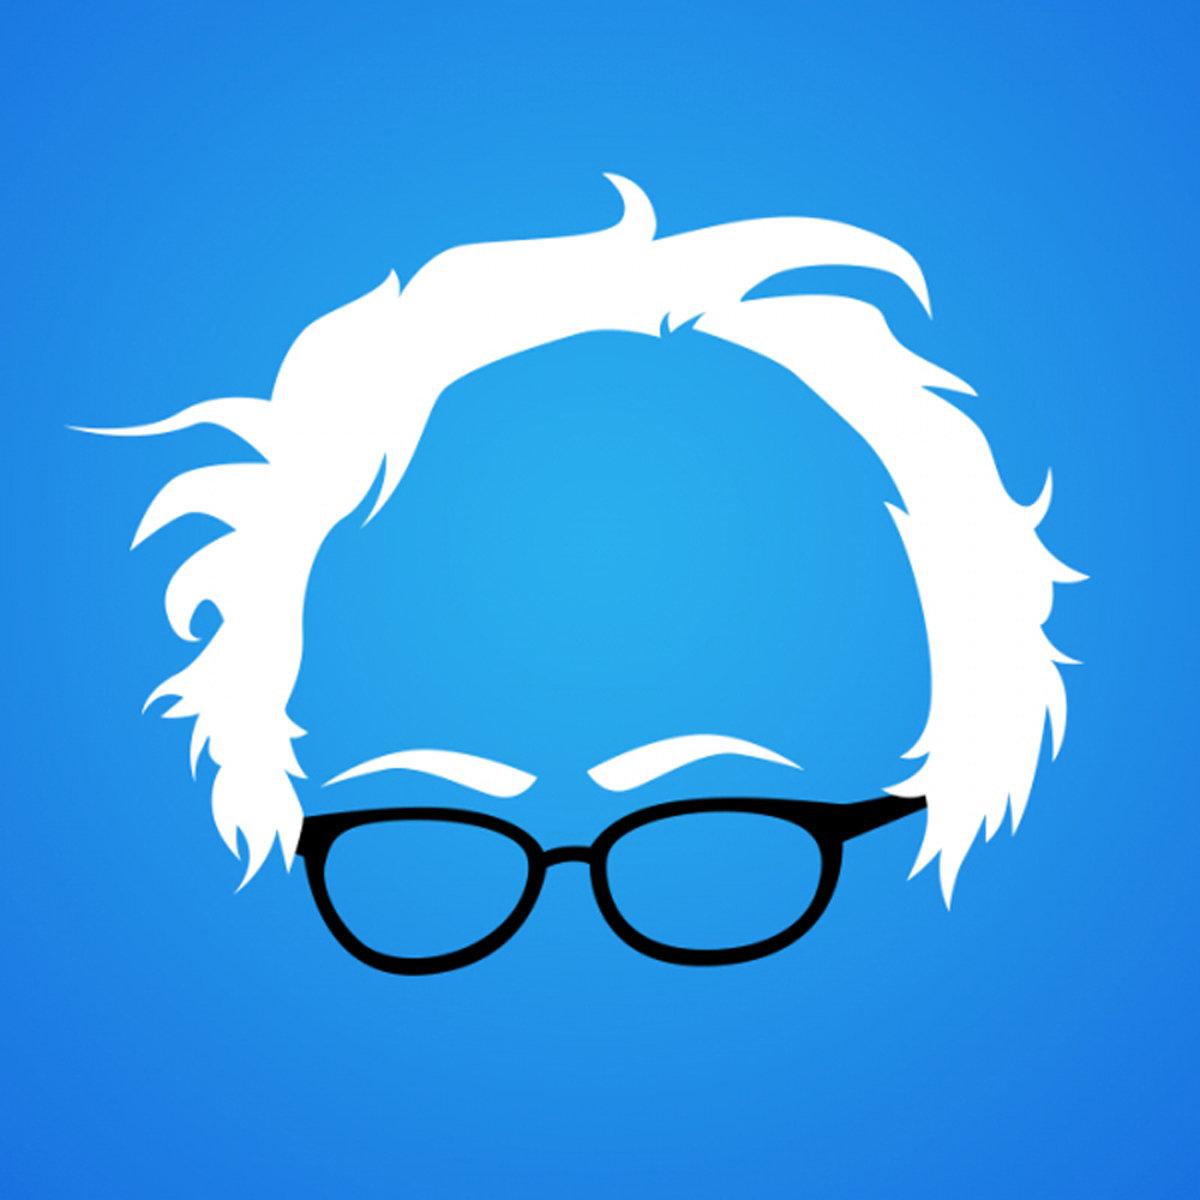 Presidential Candidates are Brands | Ketan Handa | LinkedIn